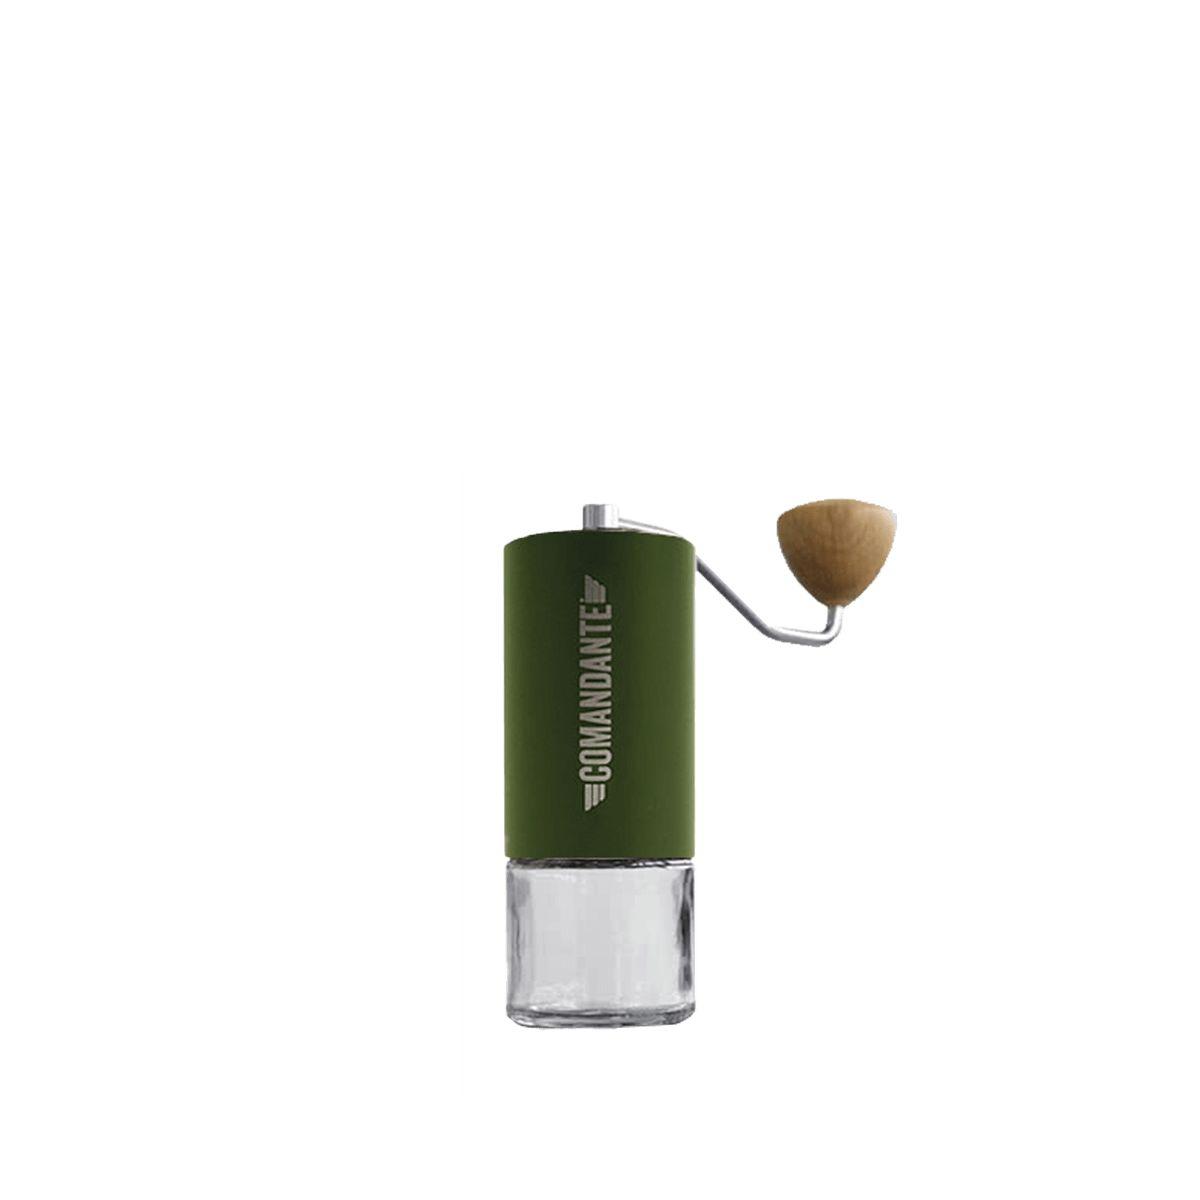 Coffee Grinder Comandante C40 [MK3] Nitro Blade - Green